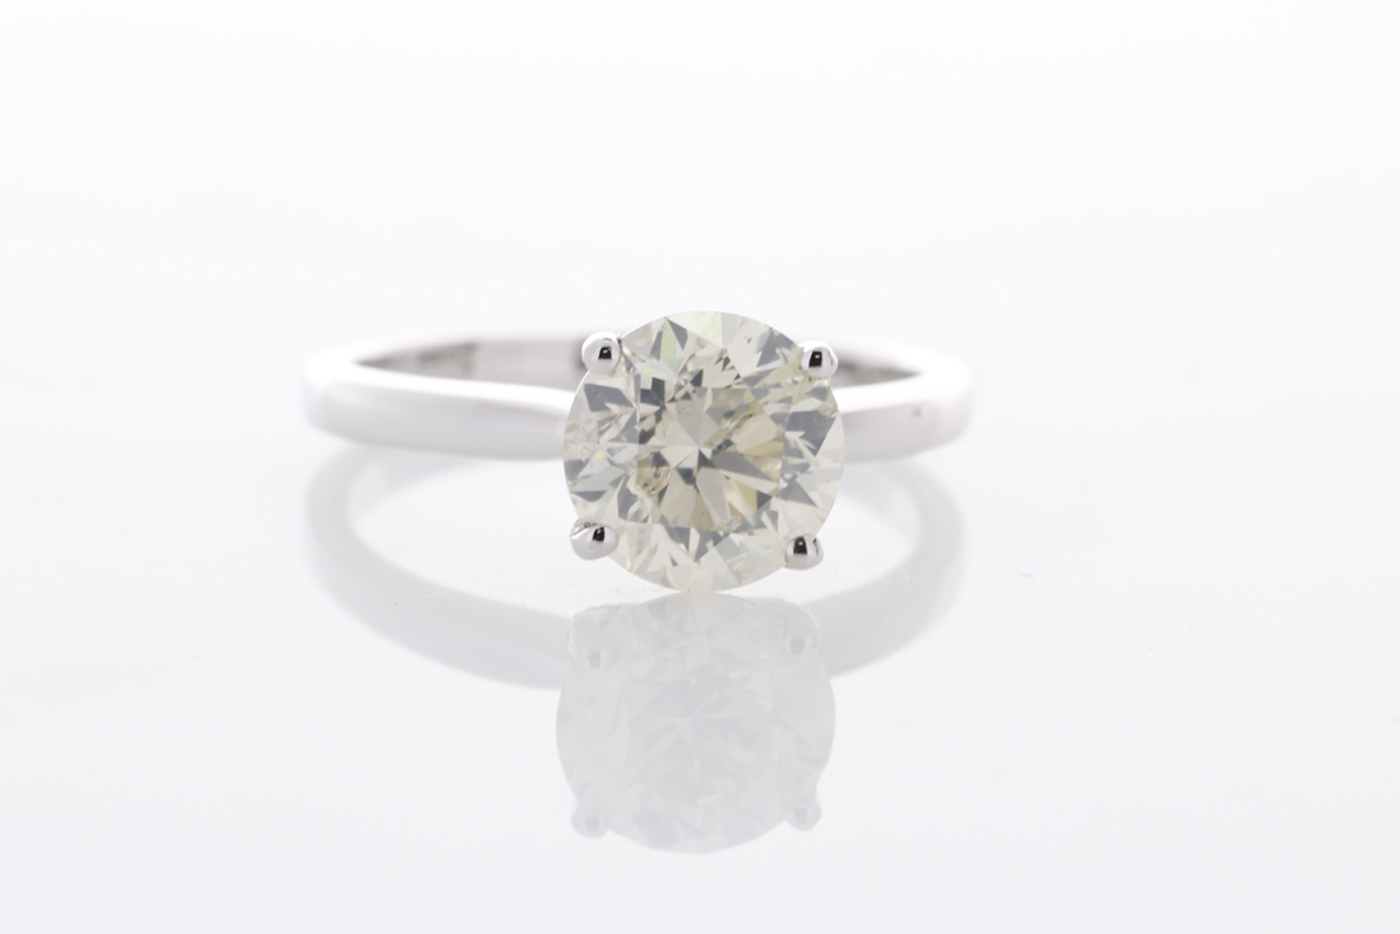 18ct White Gold Single Stone Prong Set Diamond Ring 2.02 Carats